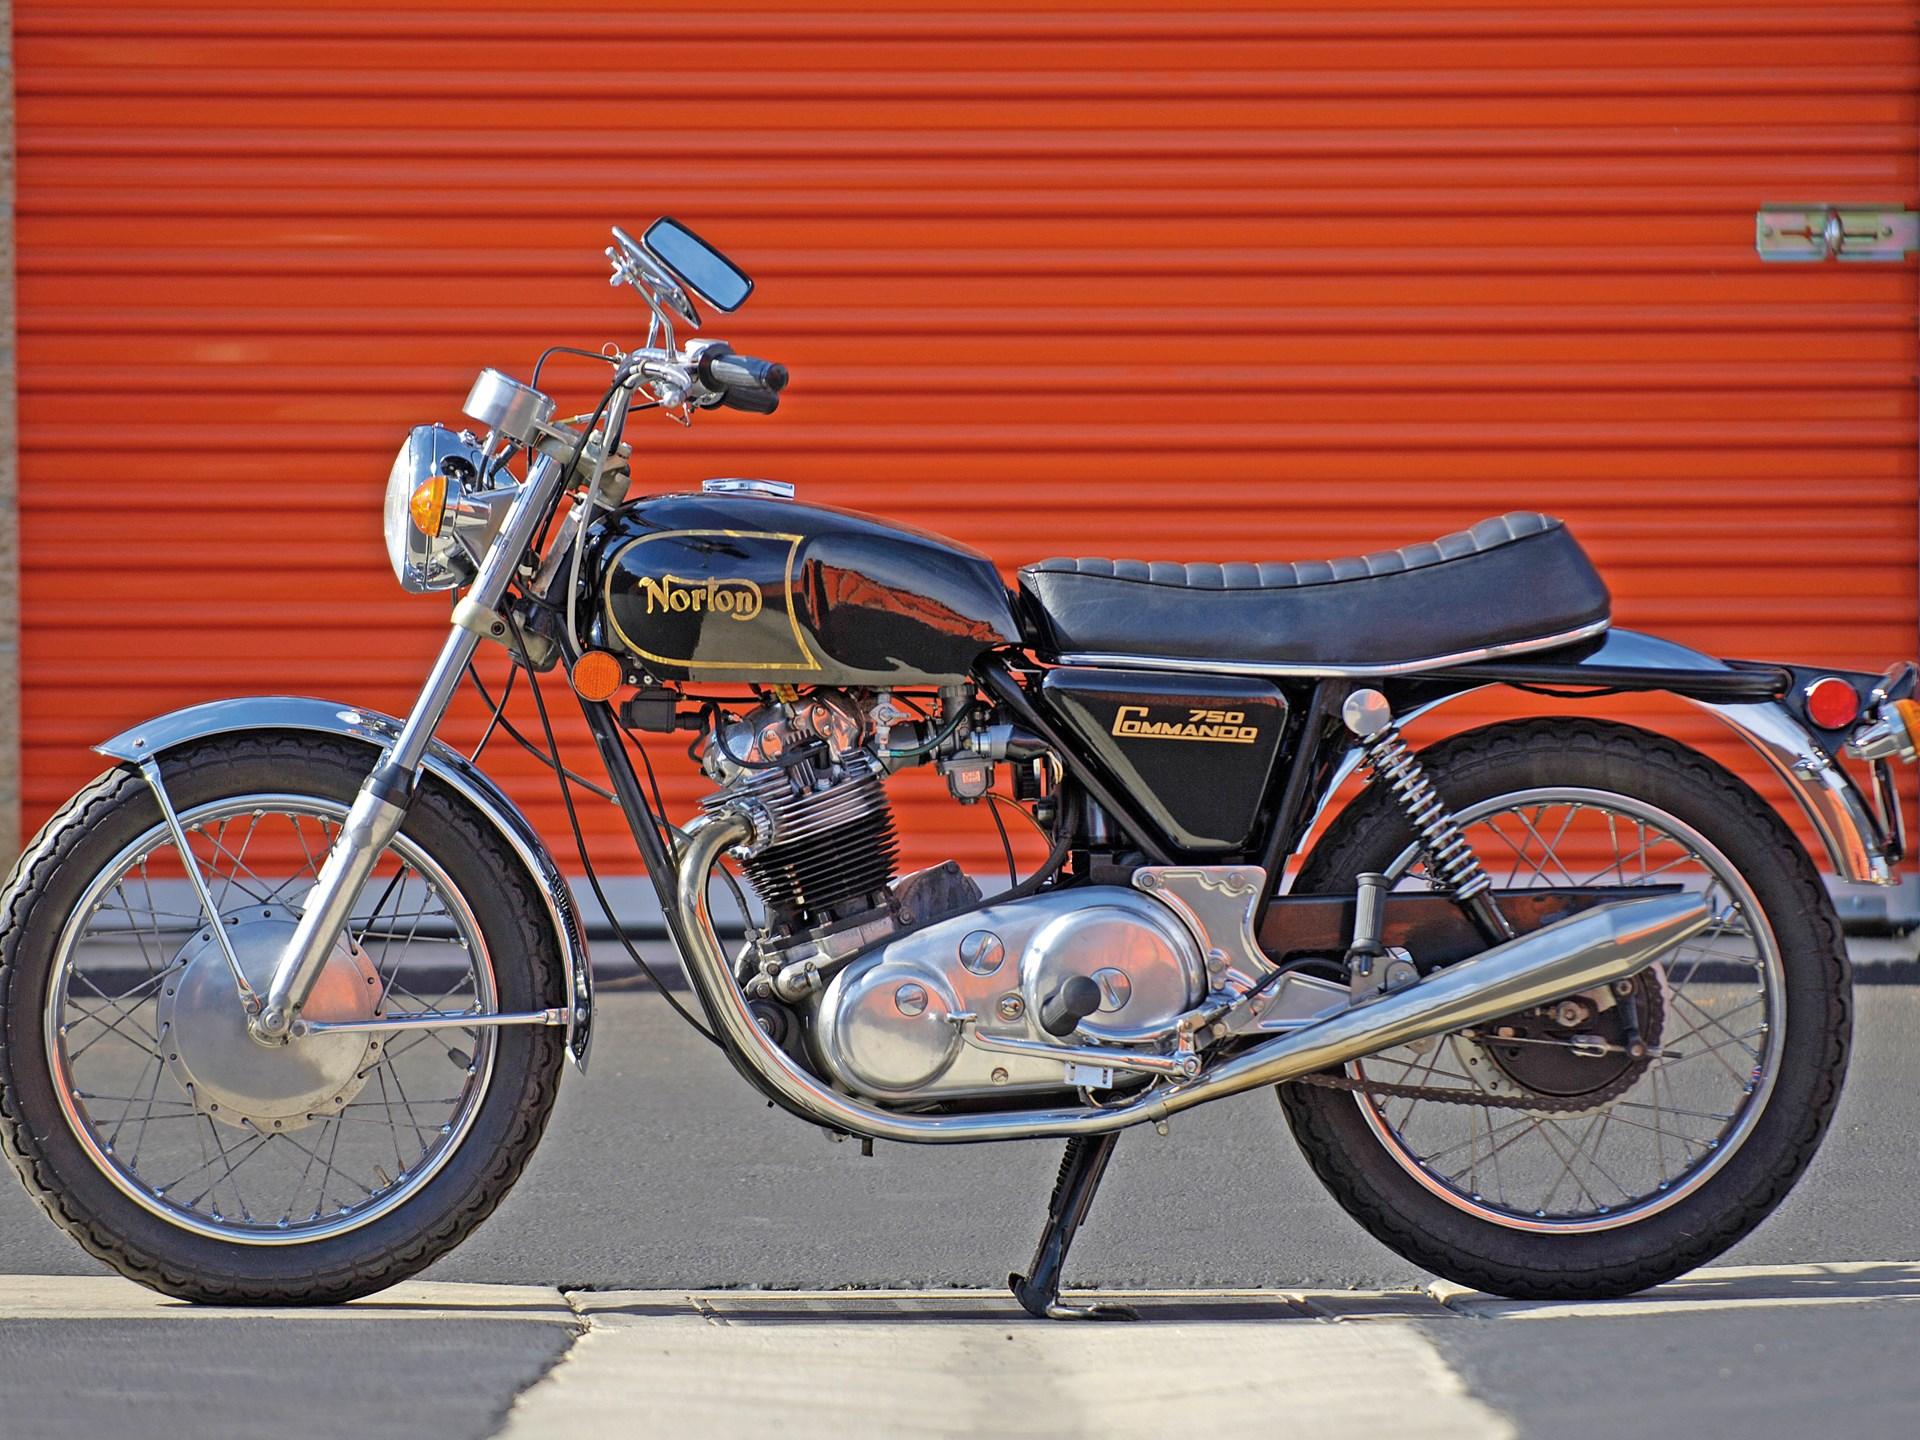 RM Sotheby's - 1971 Norton Commando 750 | Hershey 2012